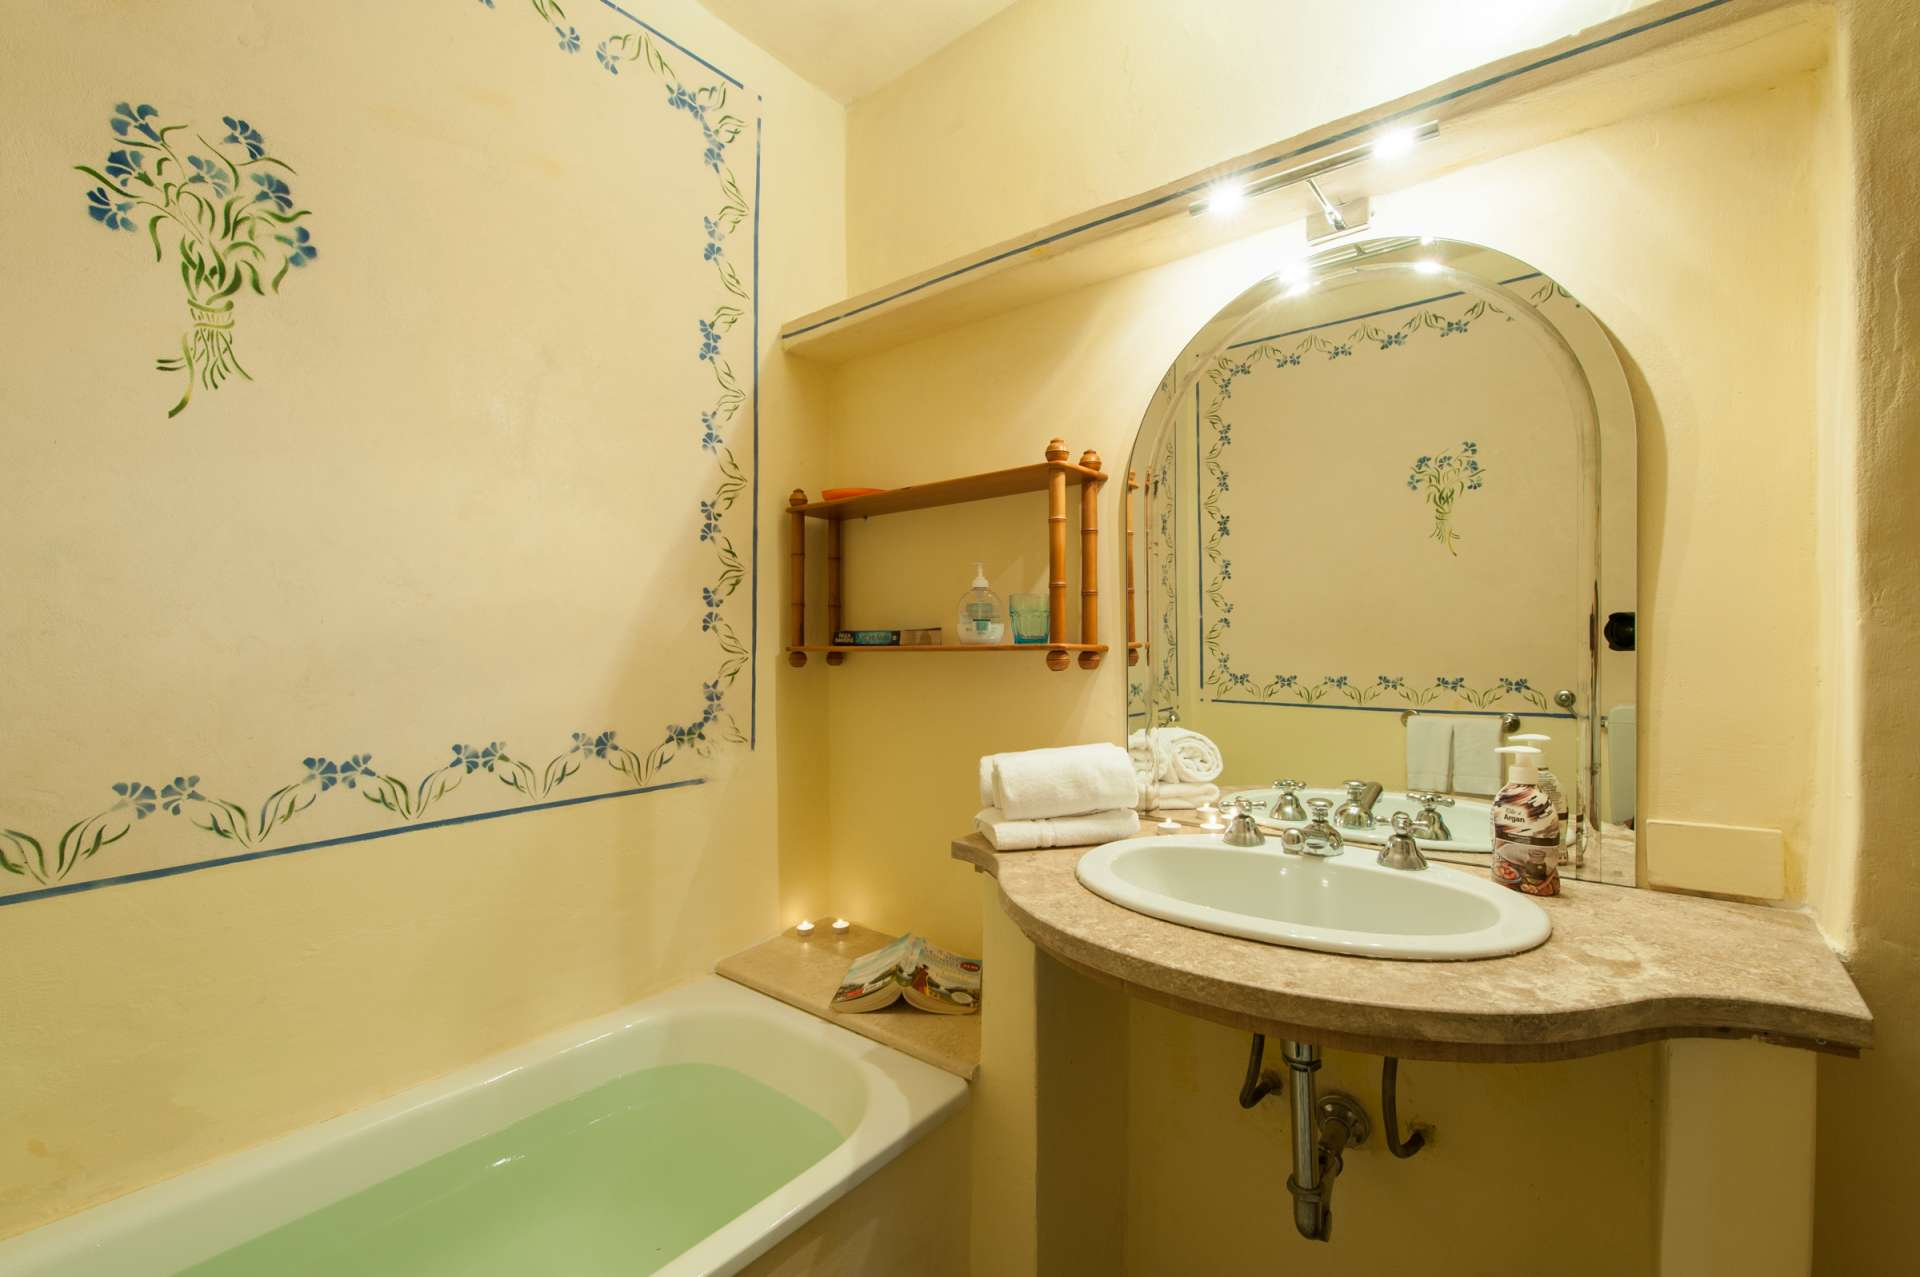 Tizzano | 9 Bed Luxury Villa with Pool | Chianti | Tuscany